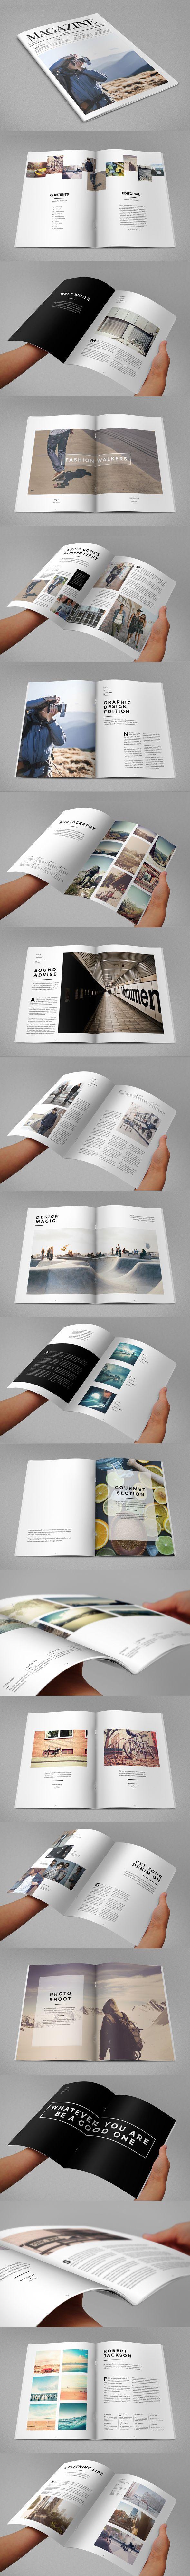 Minimal Style Magazine. Download here: http://graphicriver.net/item/minimal-style-magazine/8933496?ref=abradesign #design #mag #magazine: